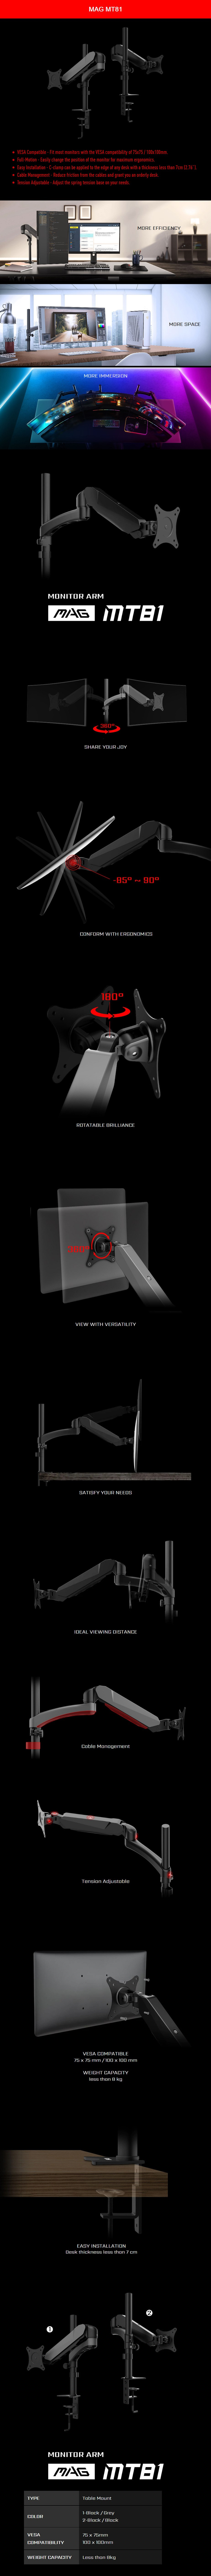 MSI MAG MT81 Monitor Arm Full Motion VESA Display Desk Mount - Overview 1